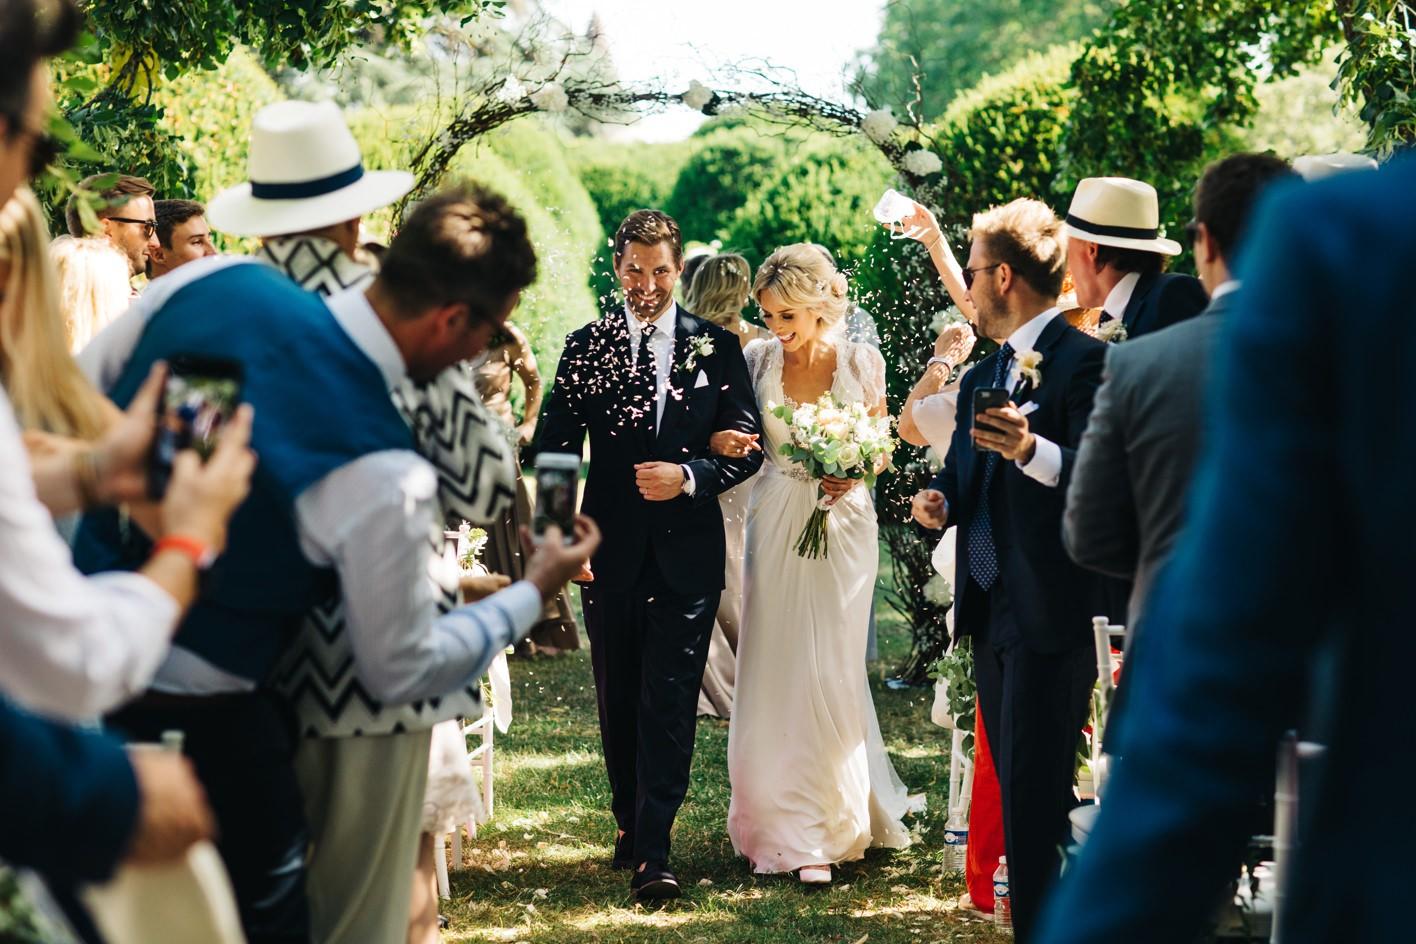 bride and groom walk down outside wedding aisle